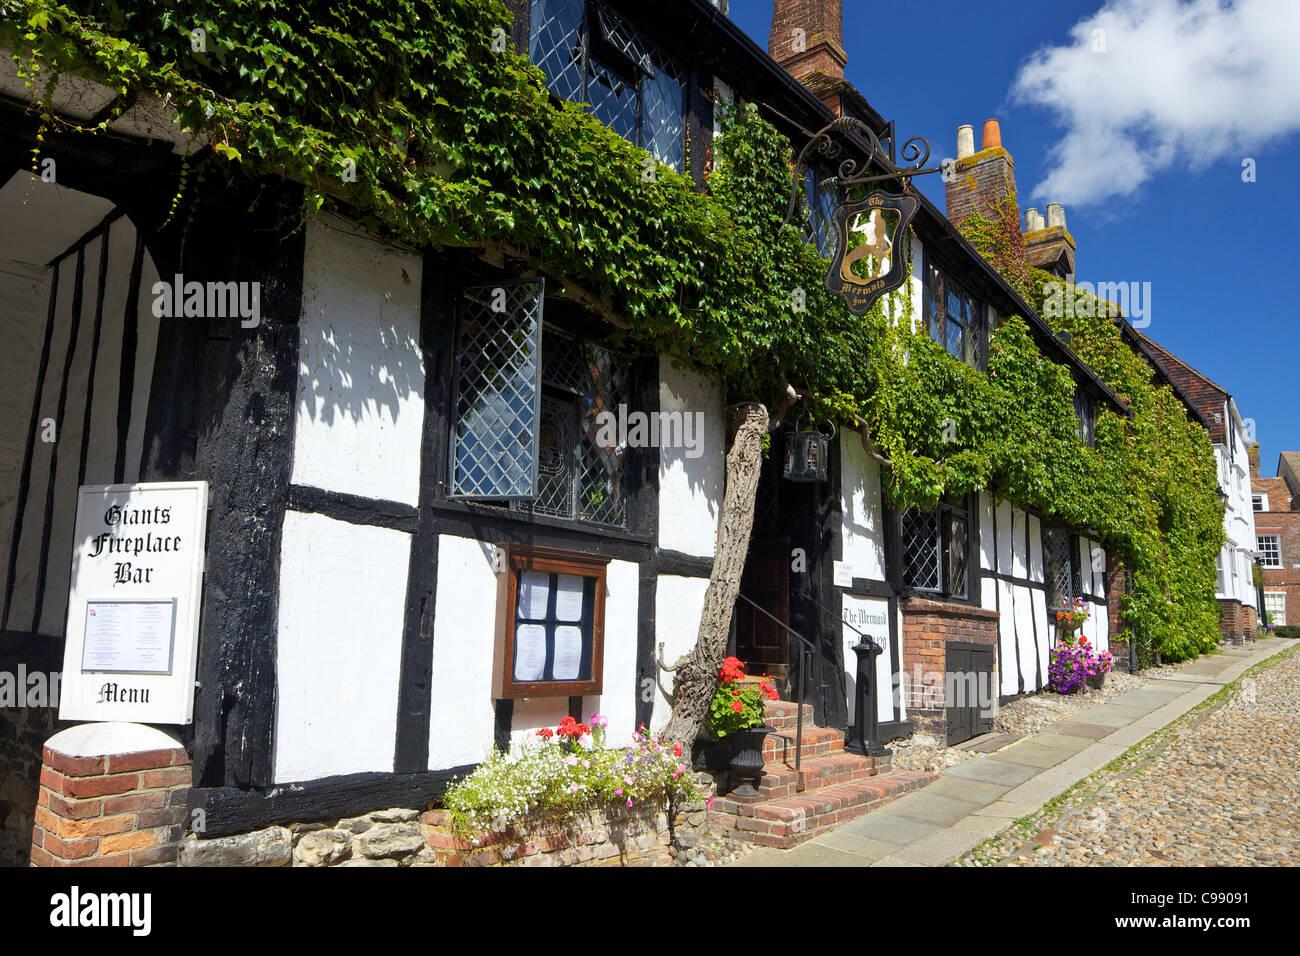 The Mermaid Inn, Mermaid Street in summer sunshine, Rye, East Sussex, England, UK, United Kingdom, GB, Great Britain, - Stock Image